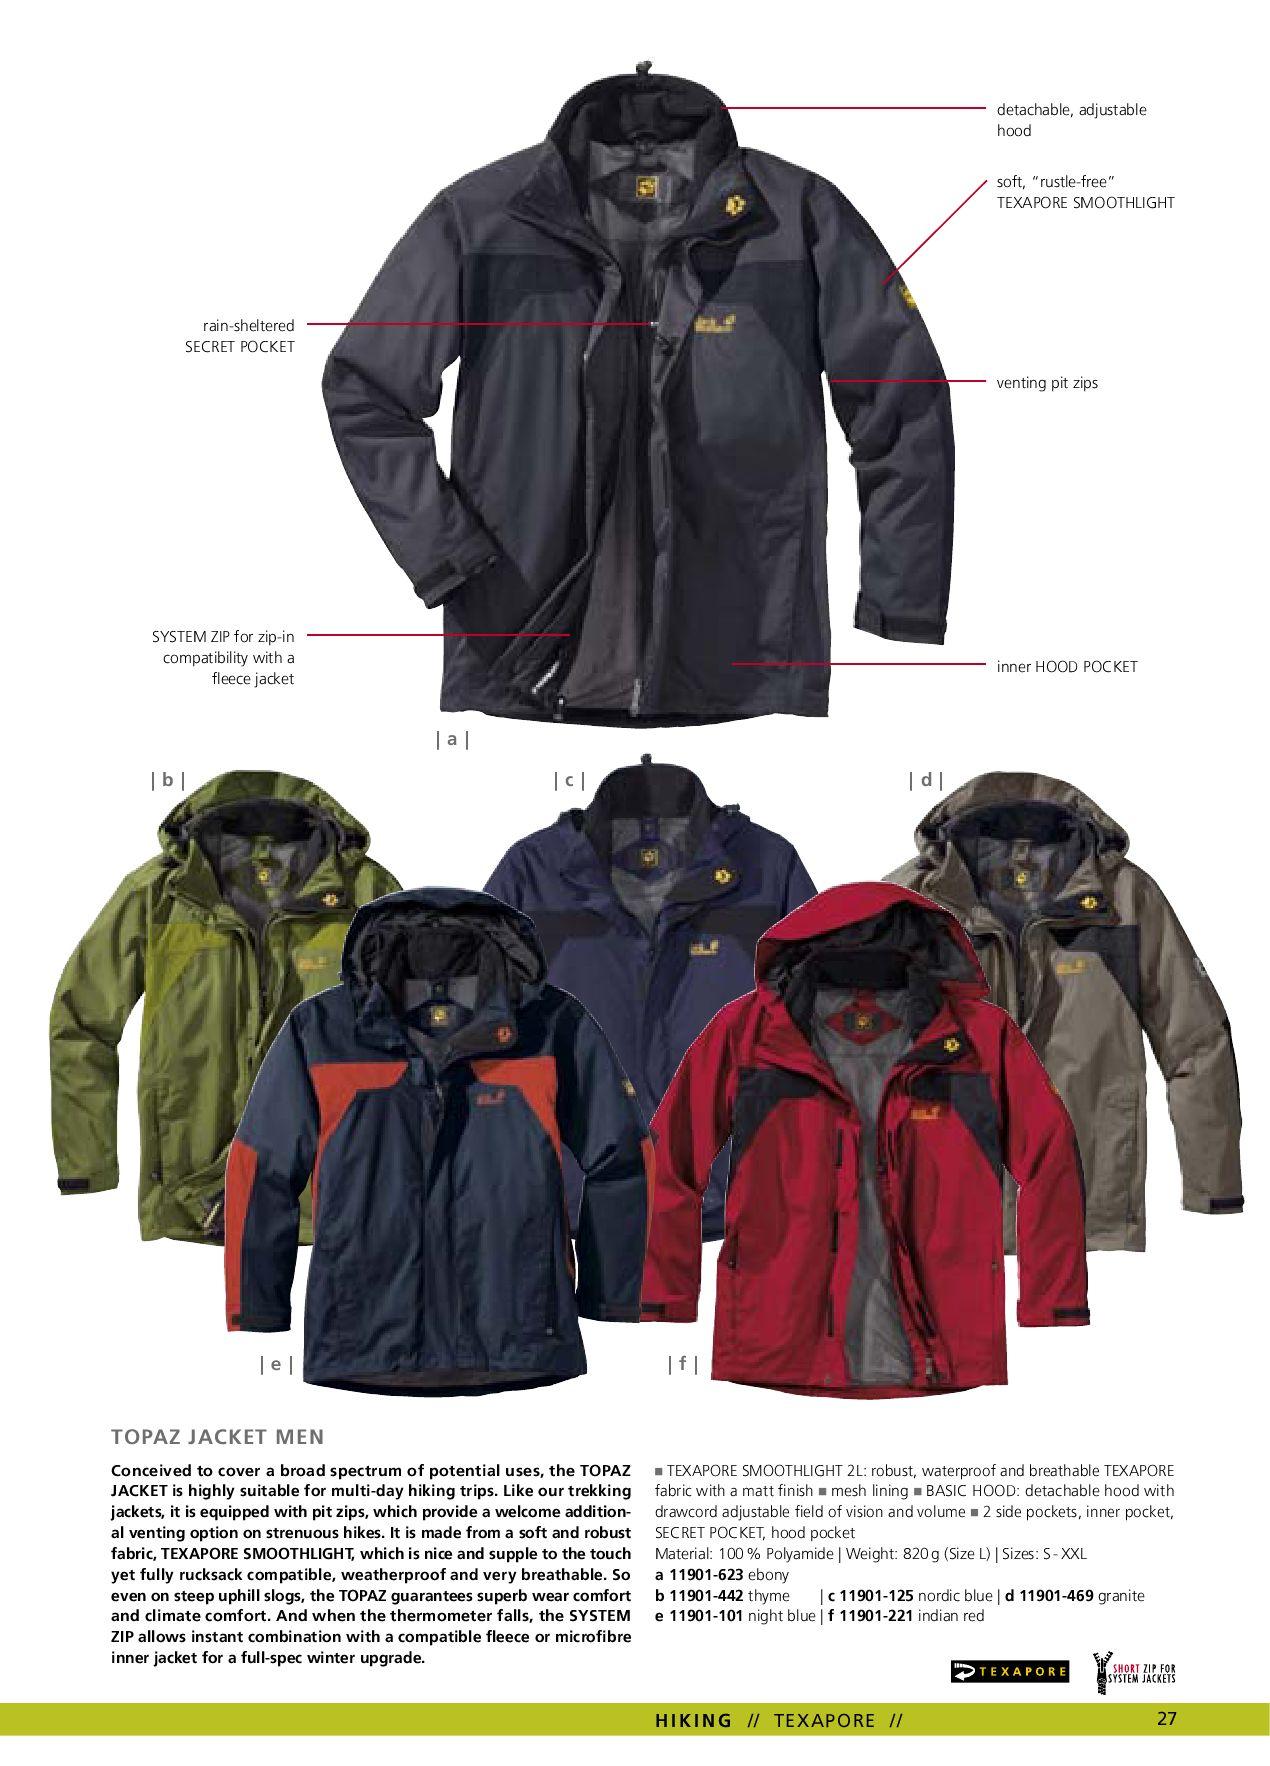 Jack Wolfskin Catalogue Winter 2009 by jeremie heriaud issuu